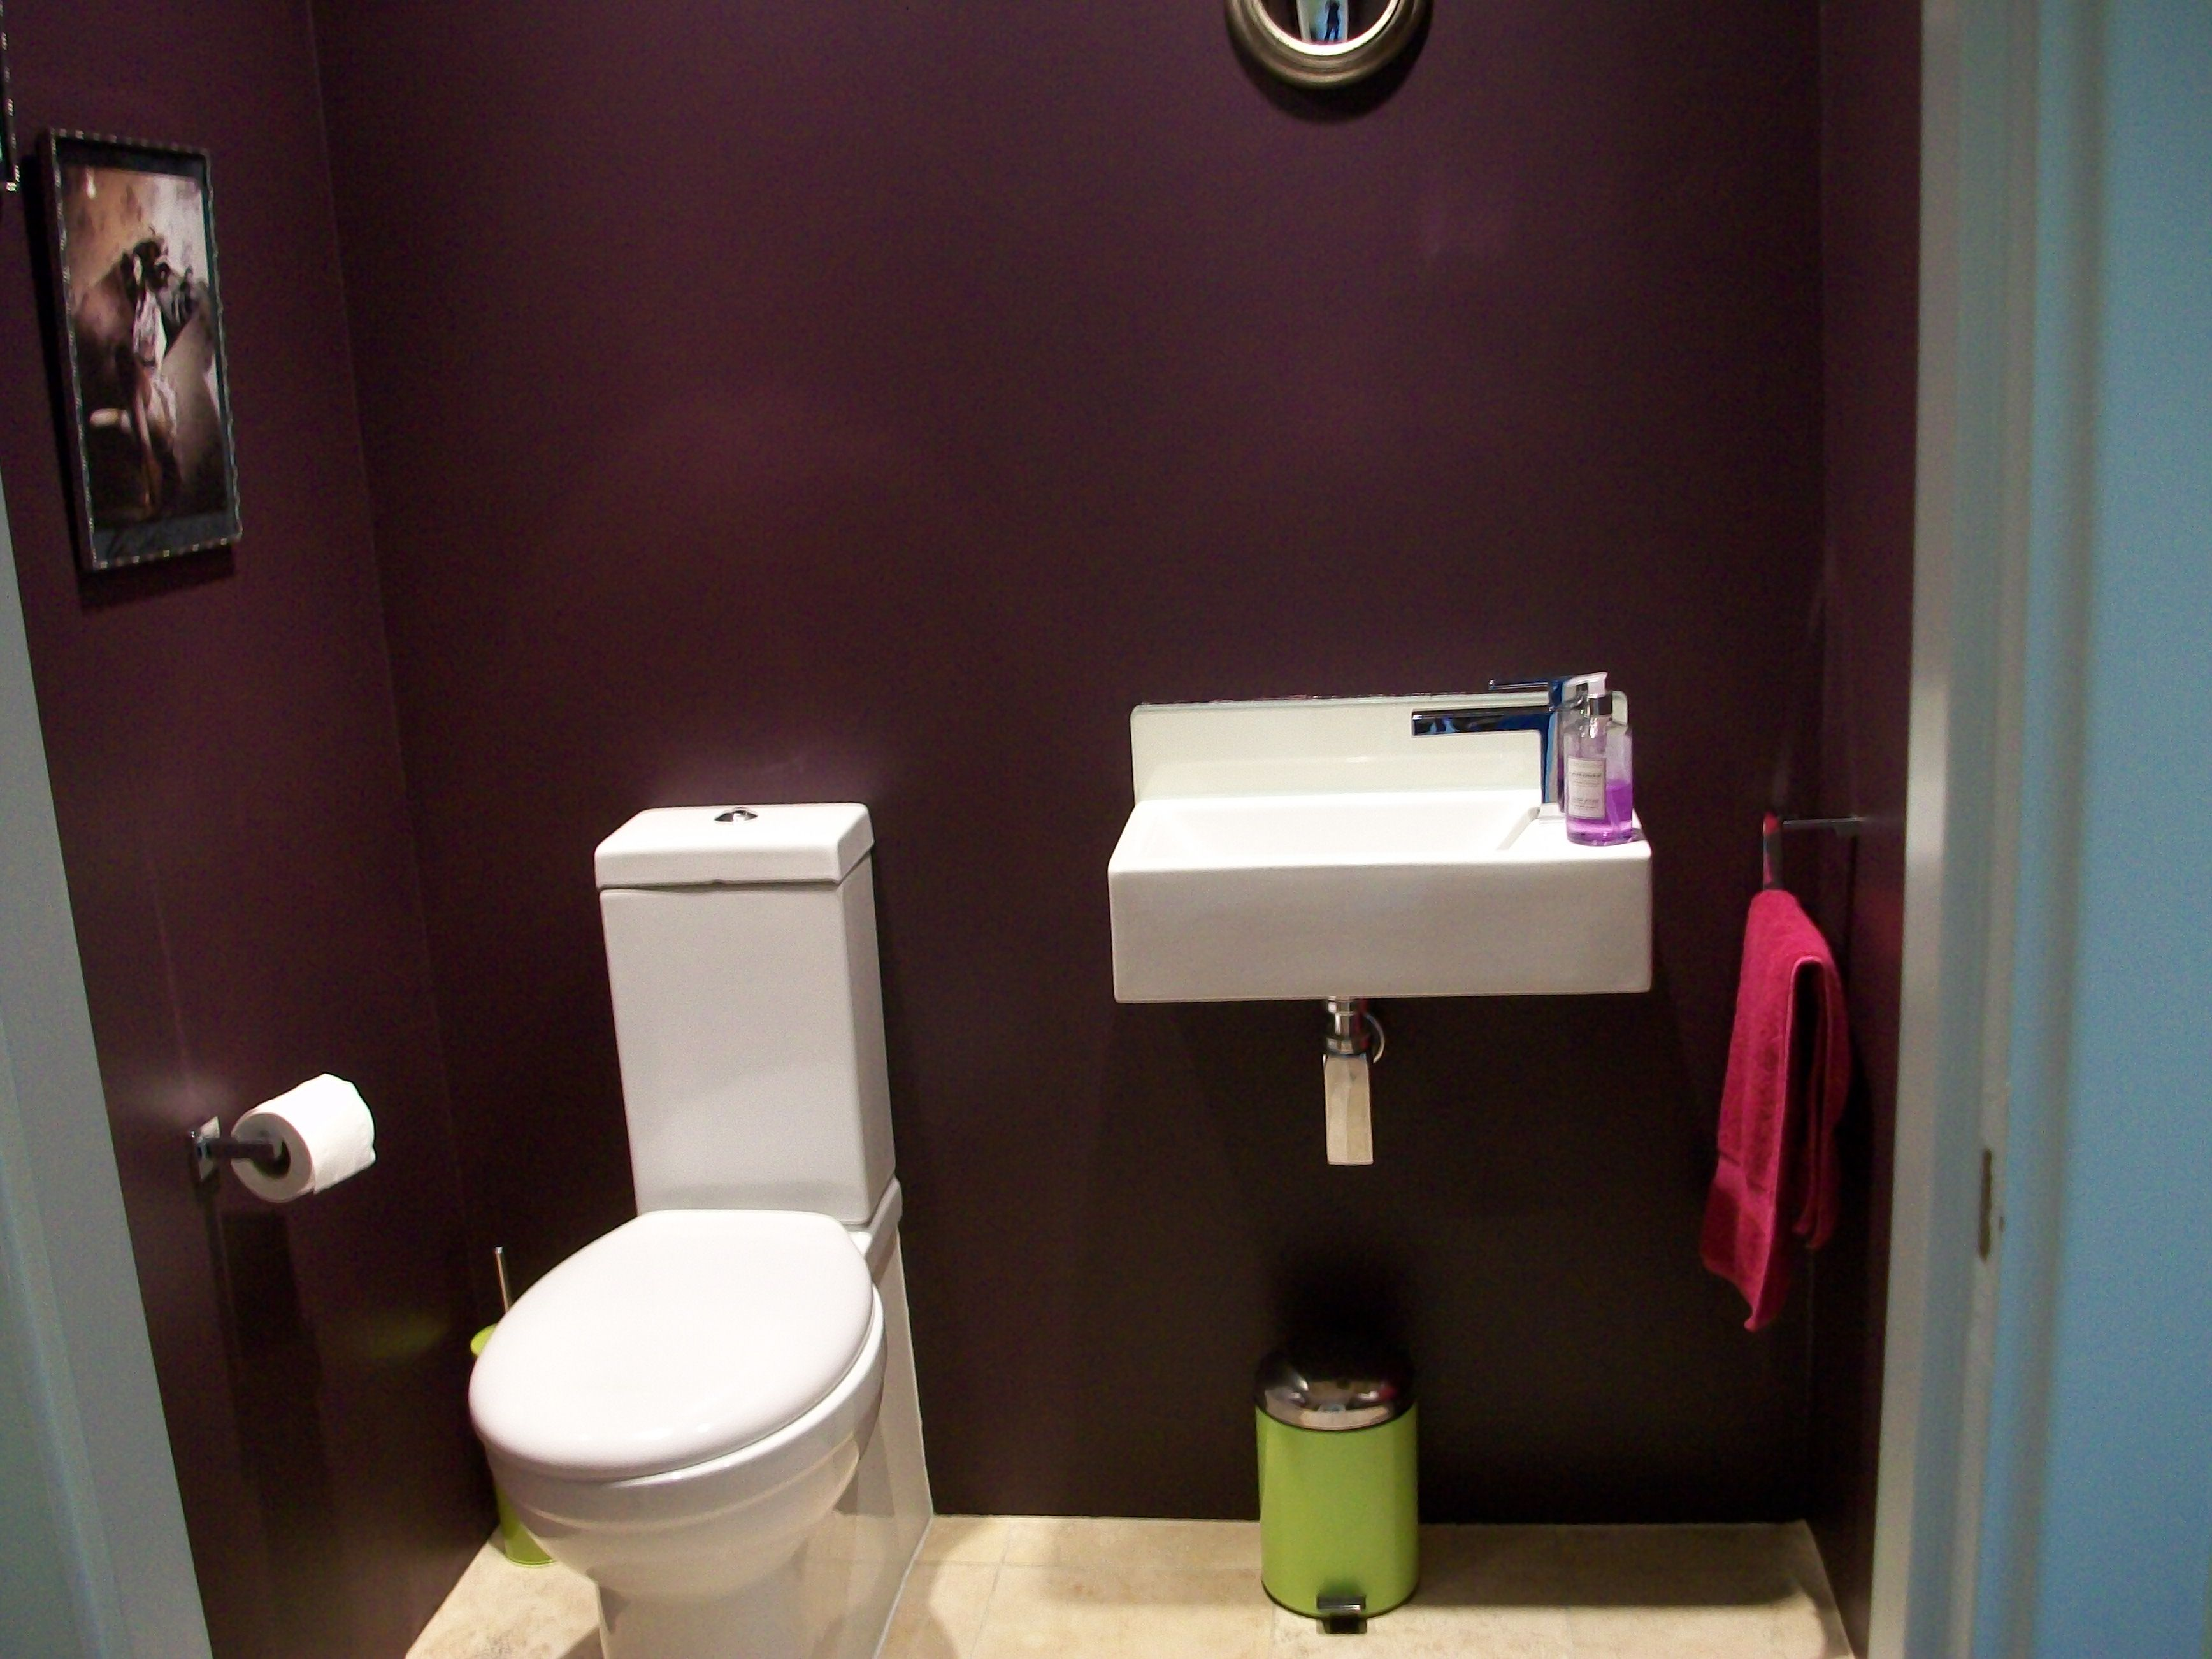 Dark bathroom paint pelt aubergine in modern emulsion from farrow ball in my cloakroom for Aubergine bathroom accessories